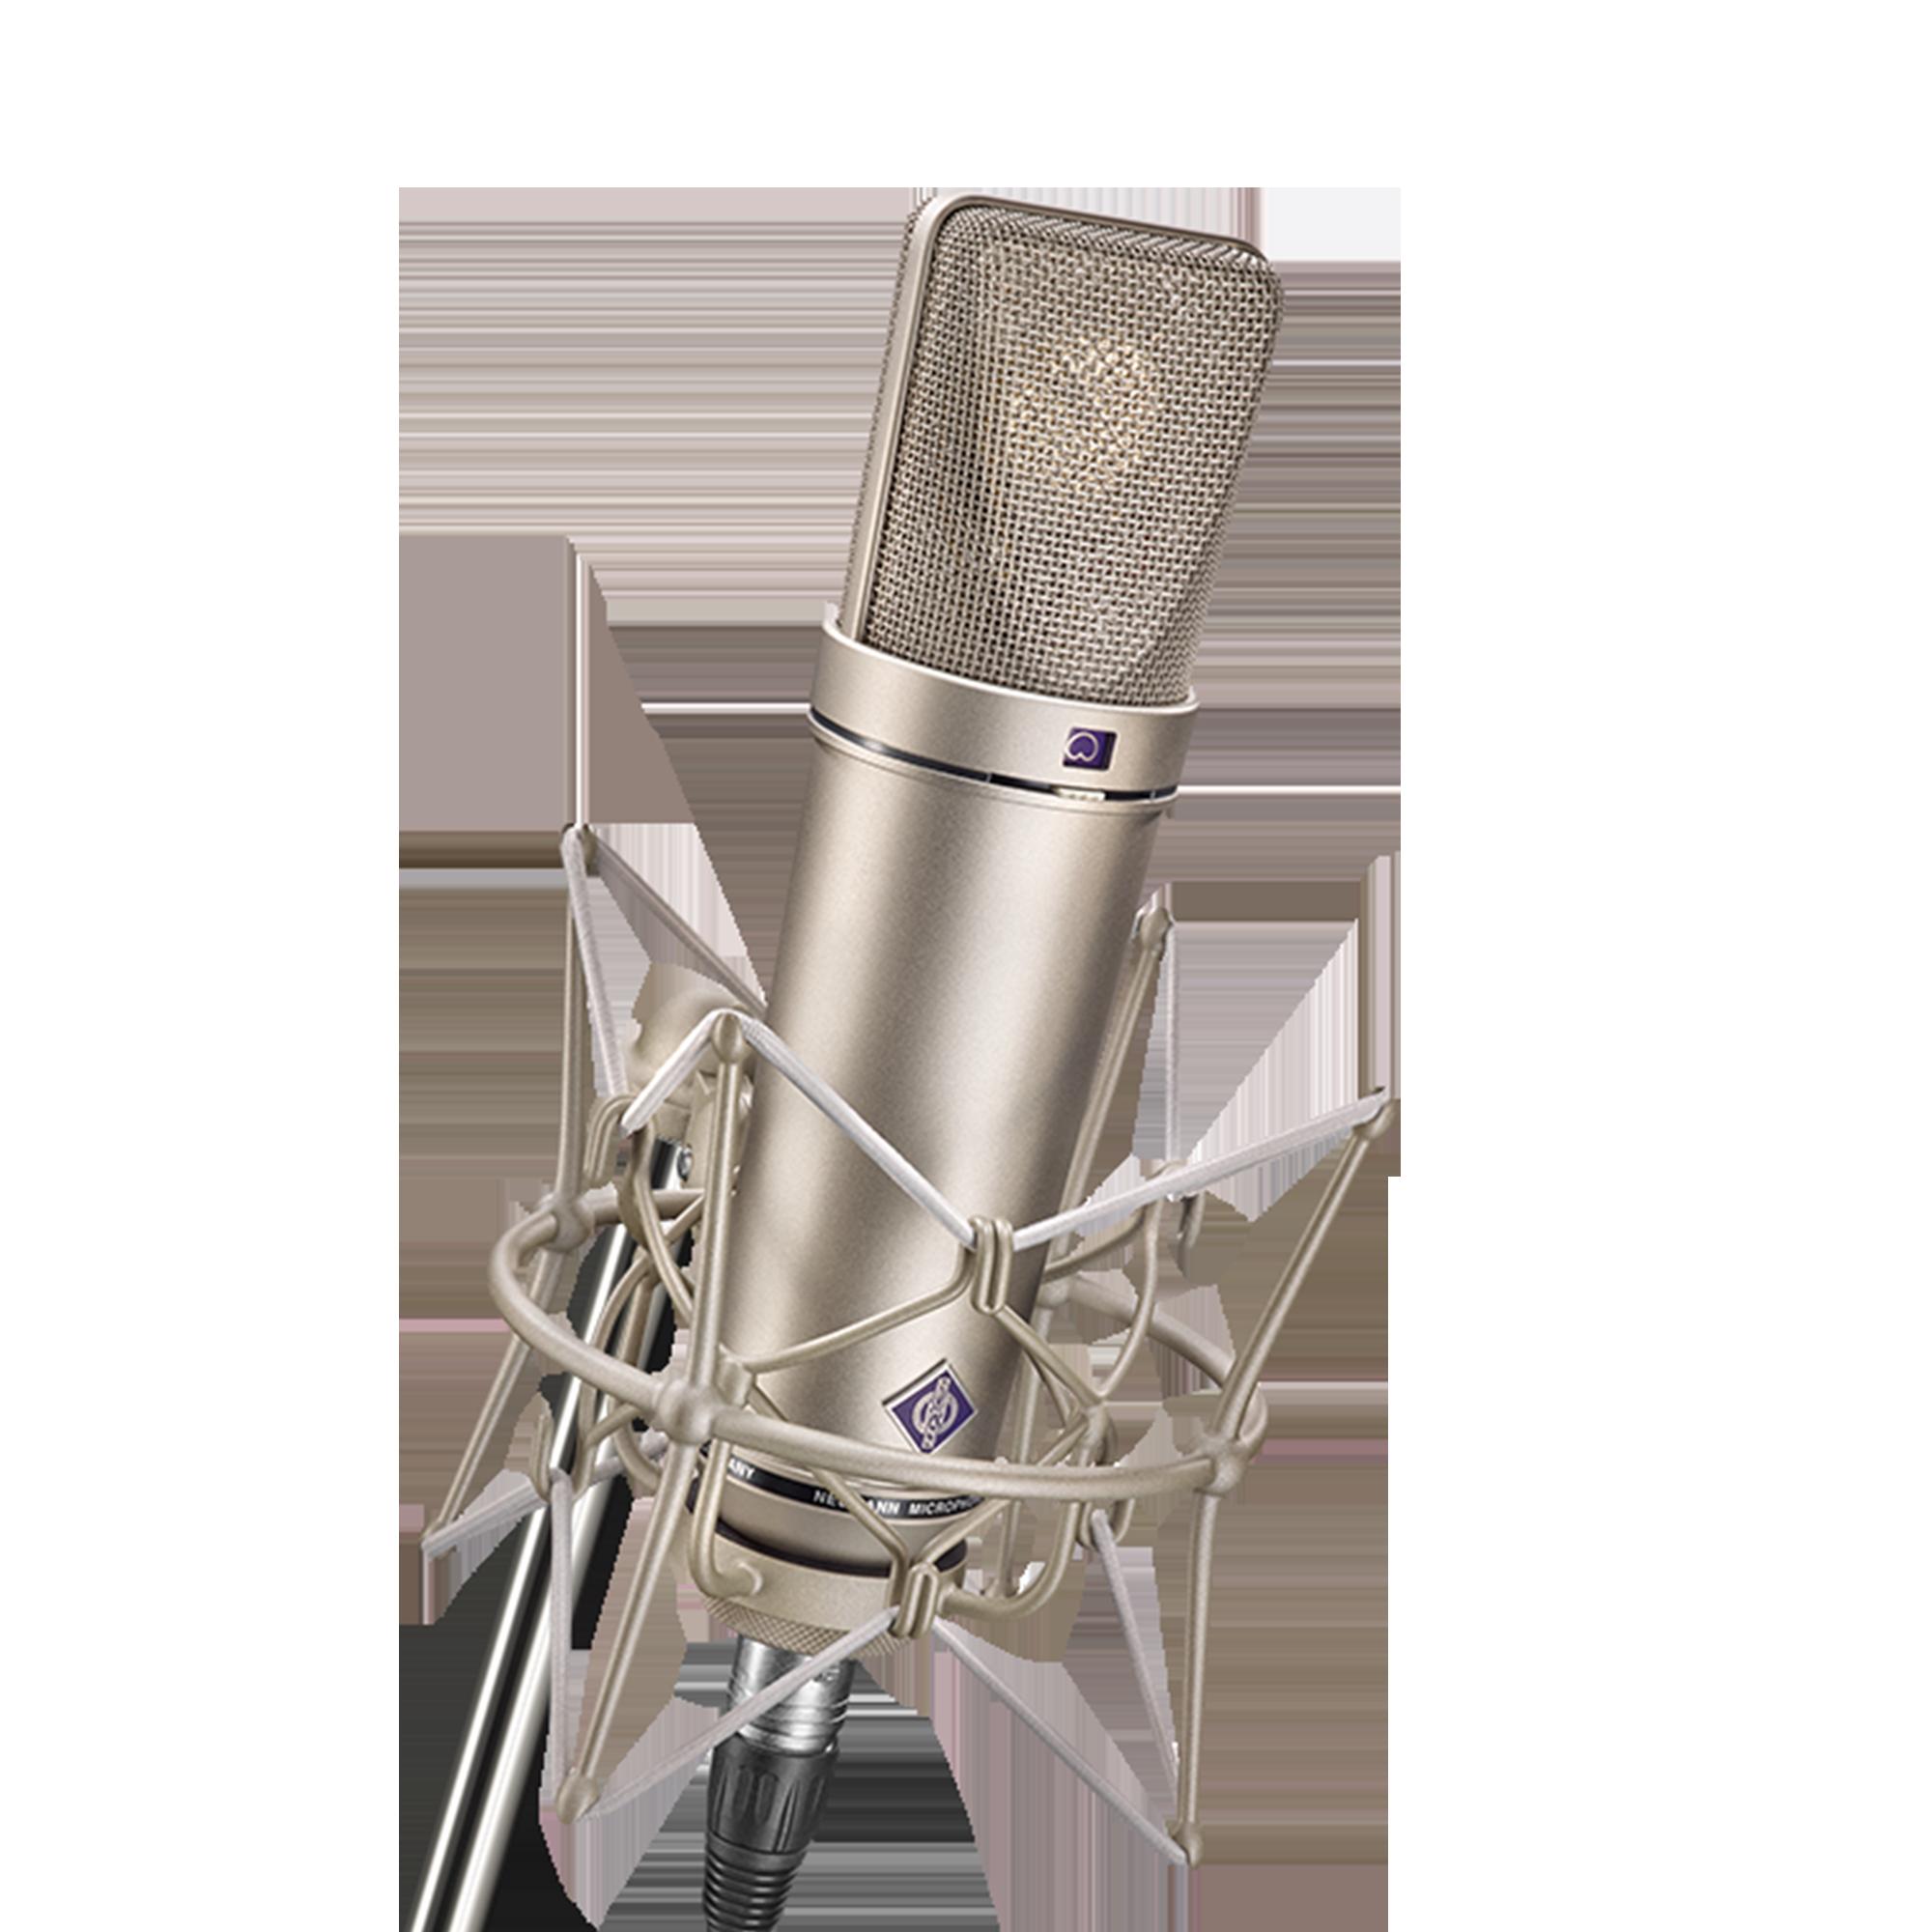 777p 0001 product detail x2 desktop u 87 ai studio set neumann studio microphone m